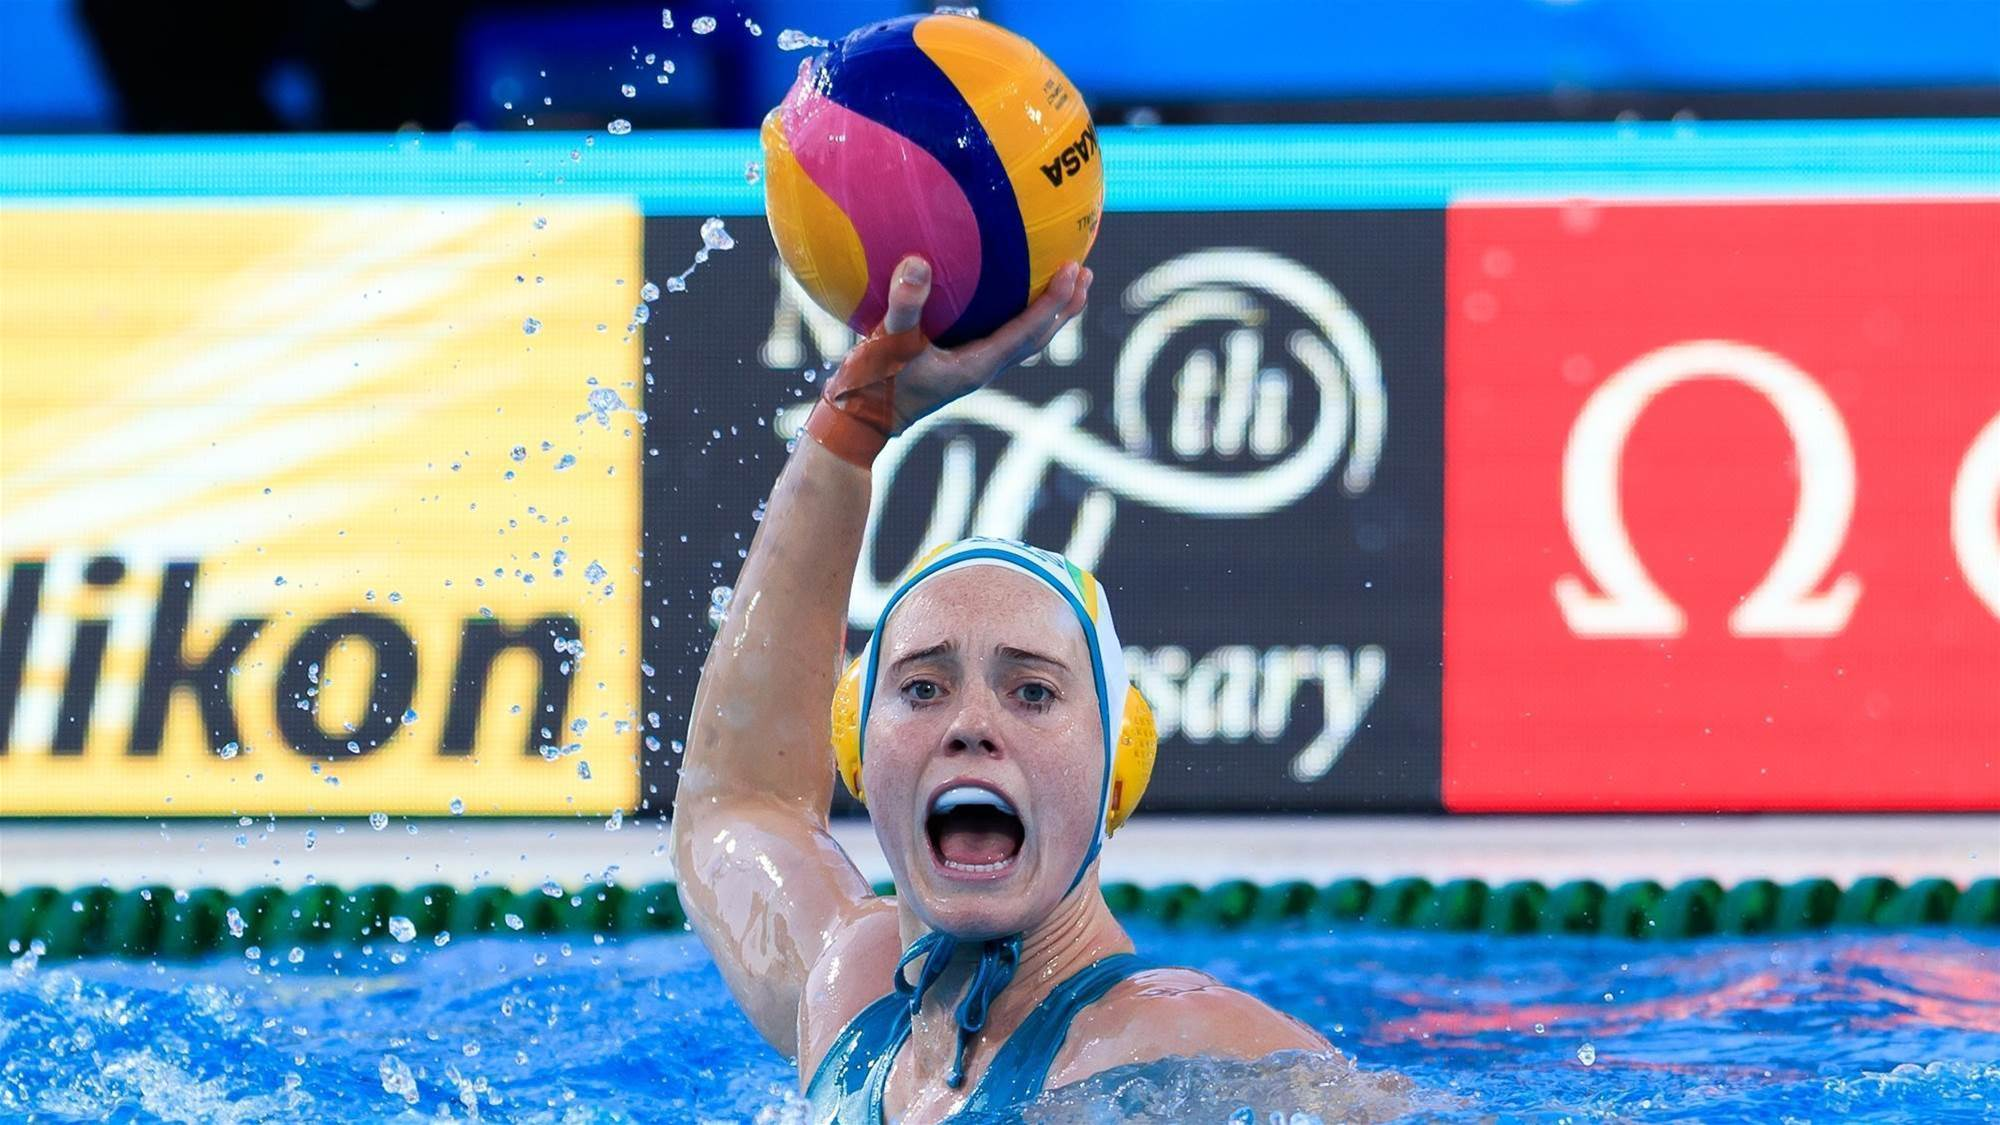 Hannah Buckling aiming for 2nd Olympics